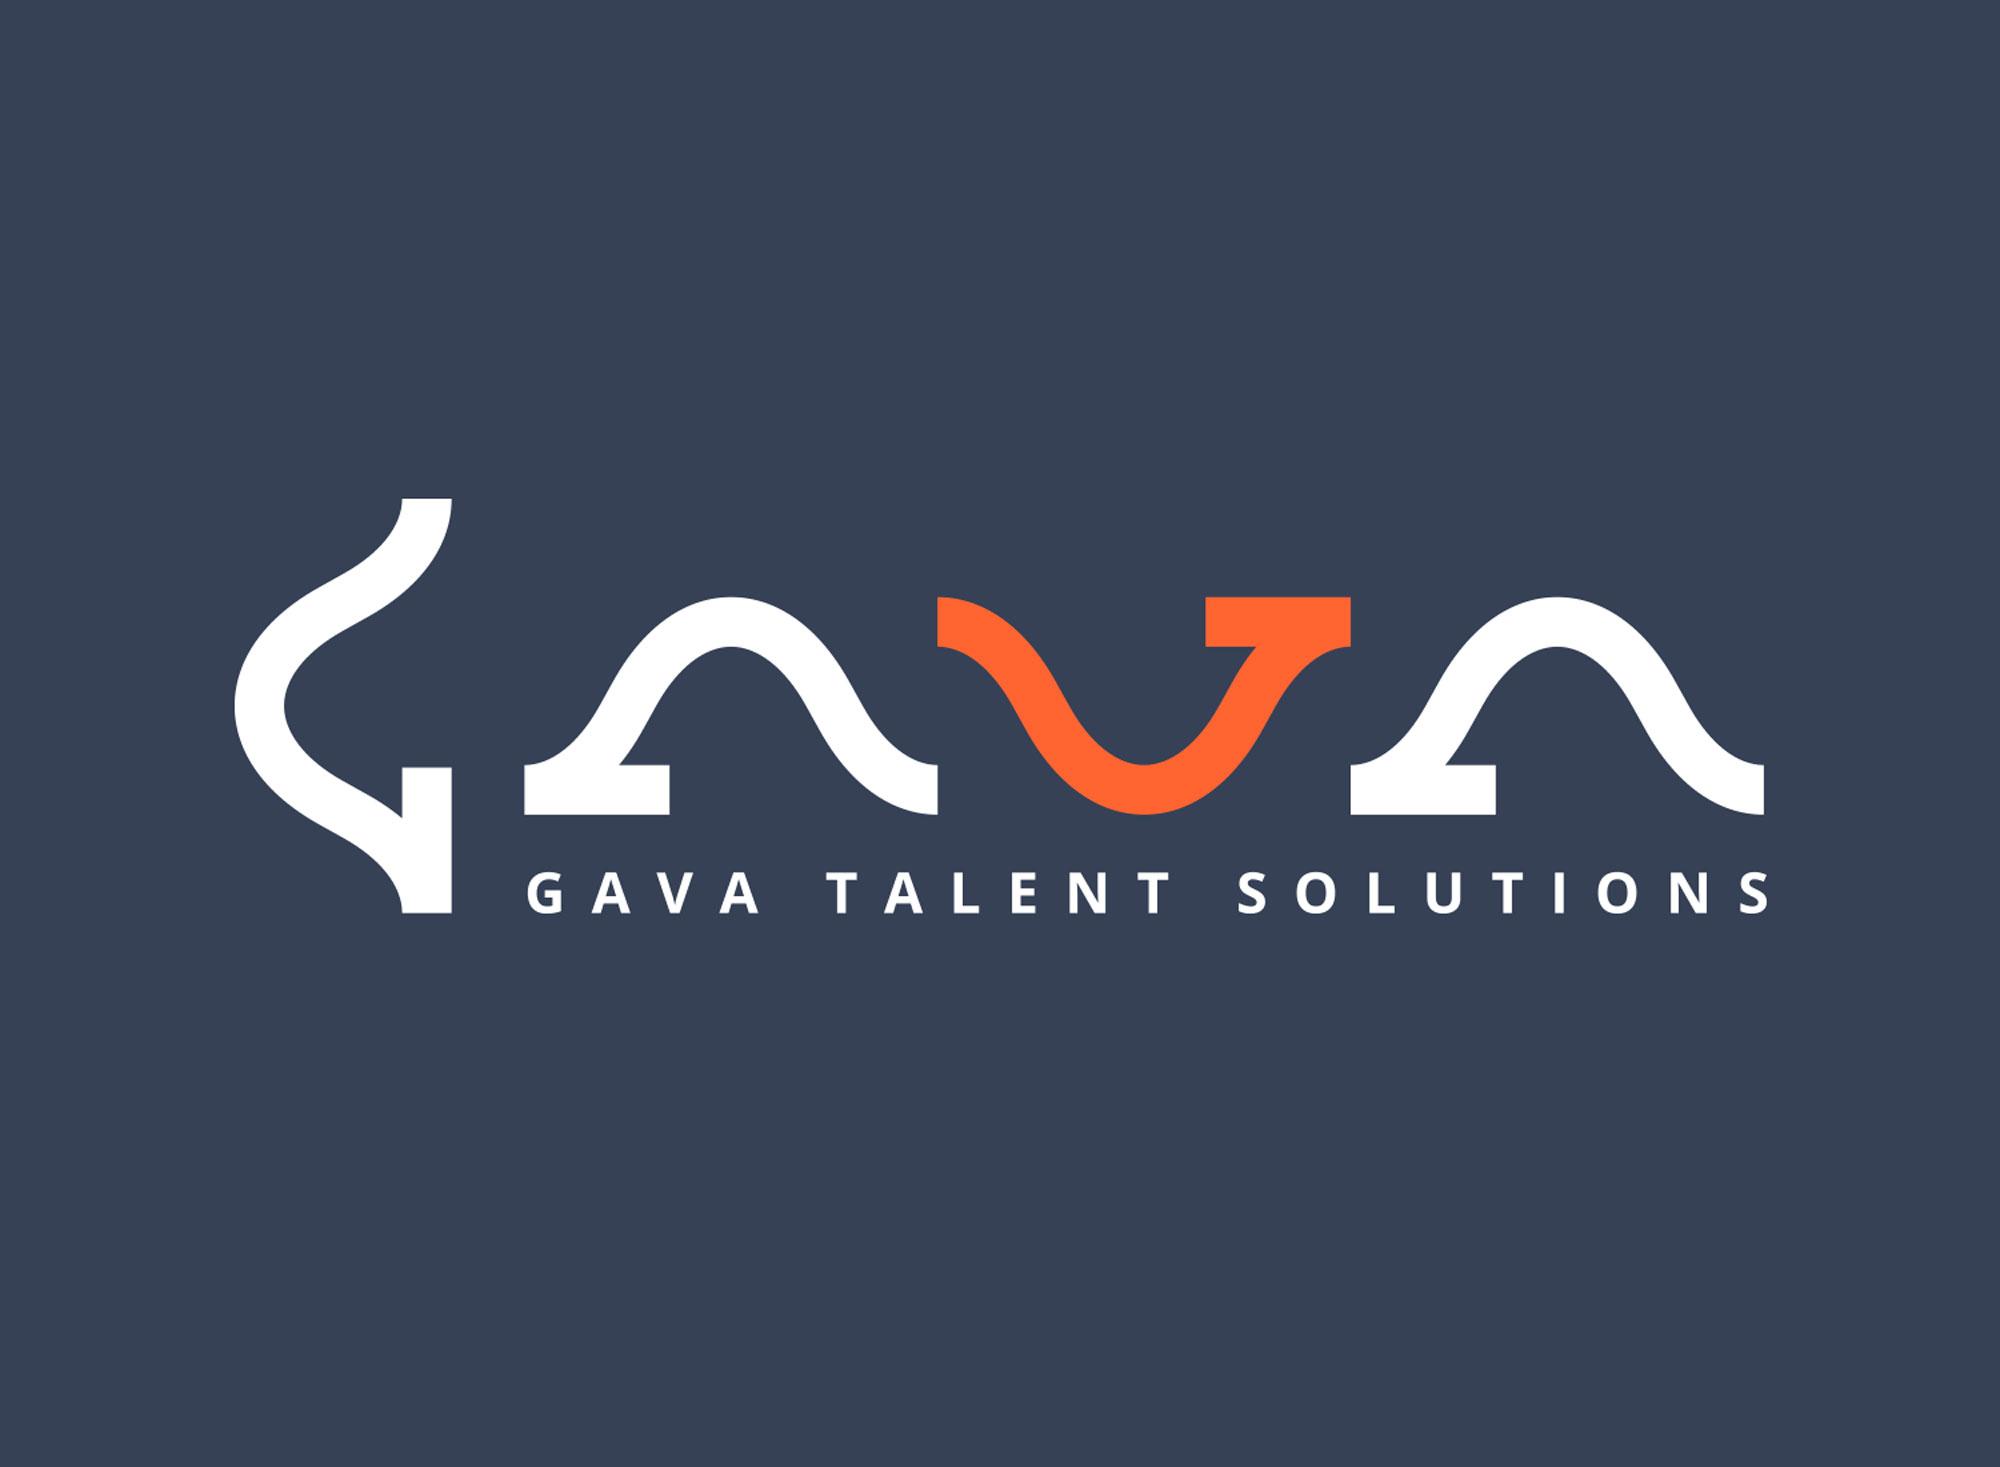 gava-logo-flow-concept